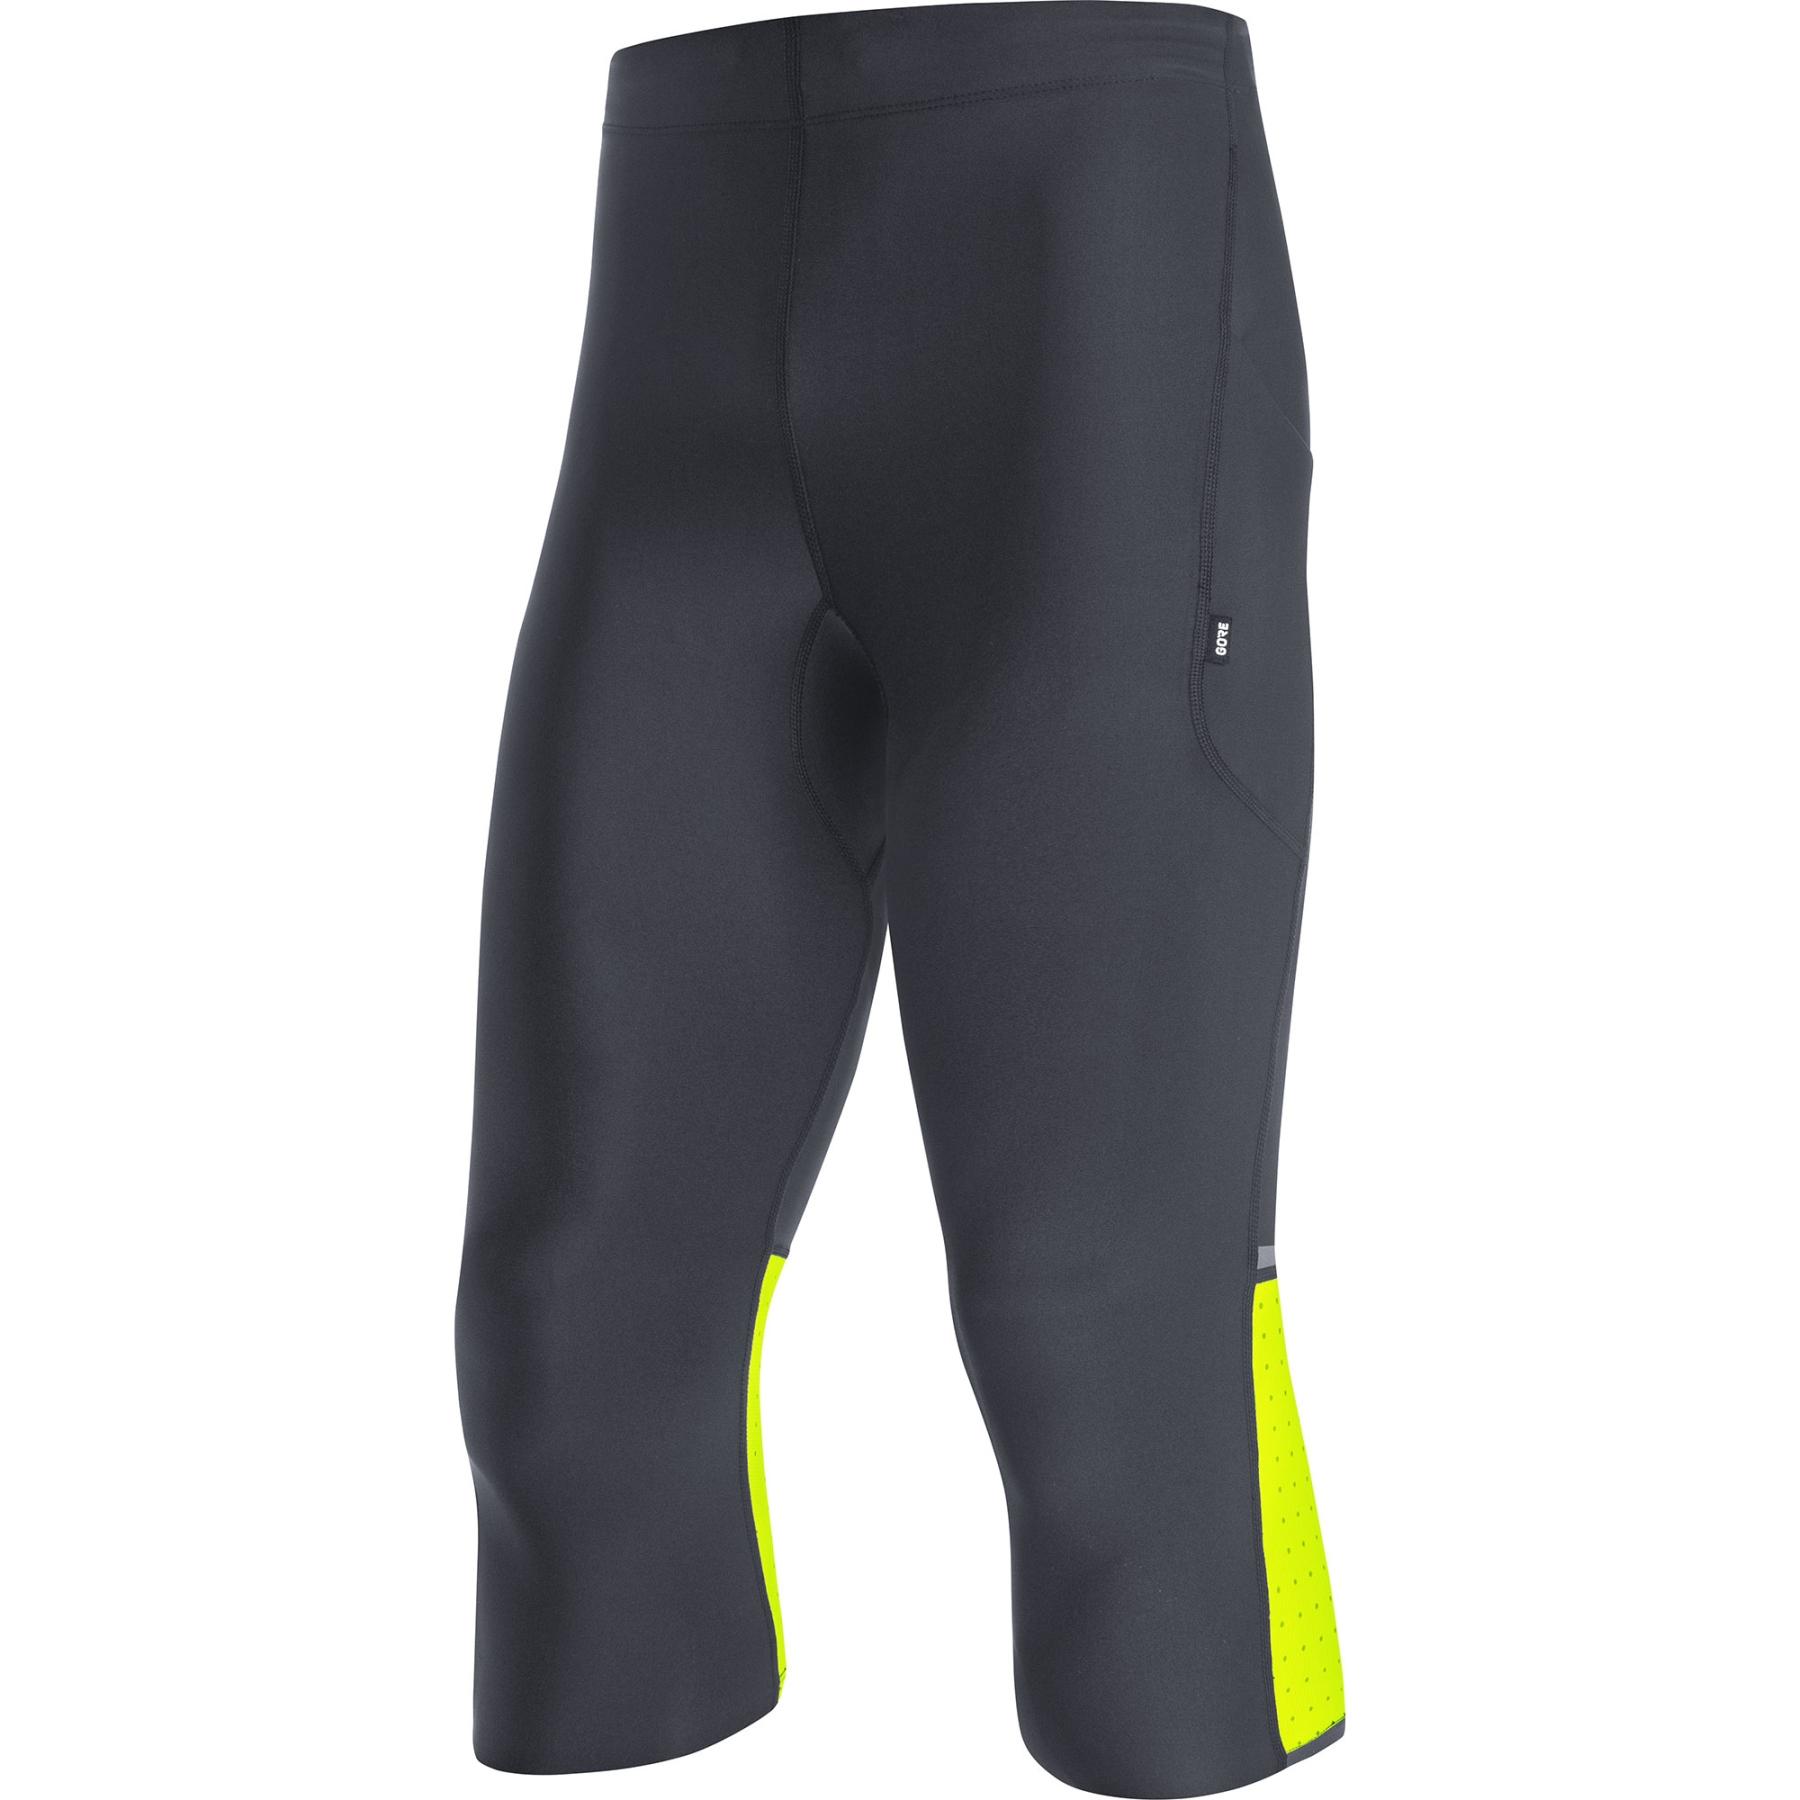 GORE Wear Impulse 3/4 Lauftights - neon yellow 0800